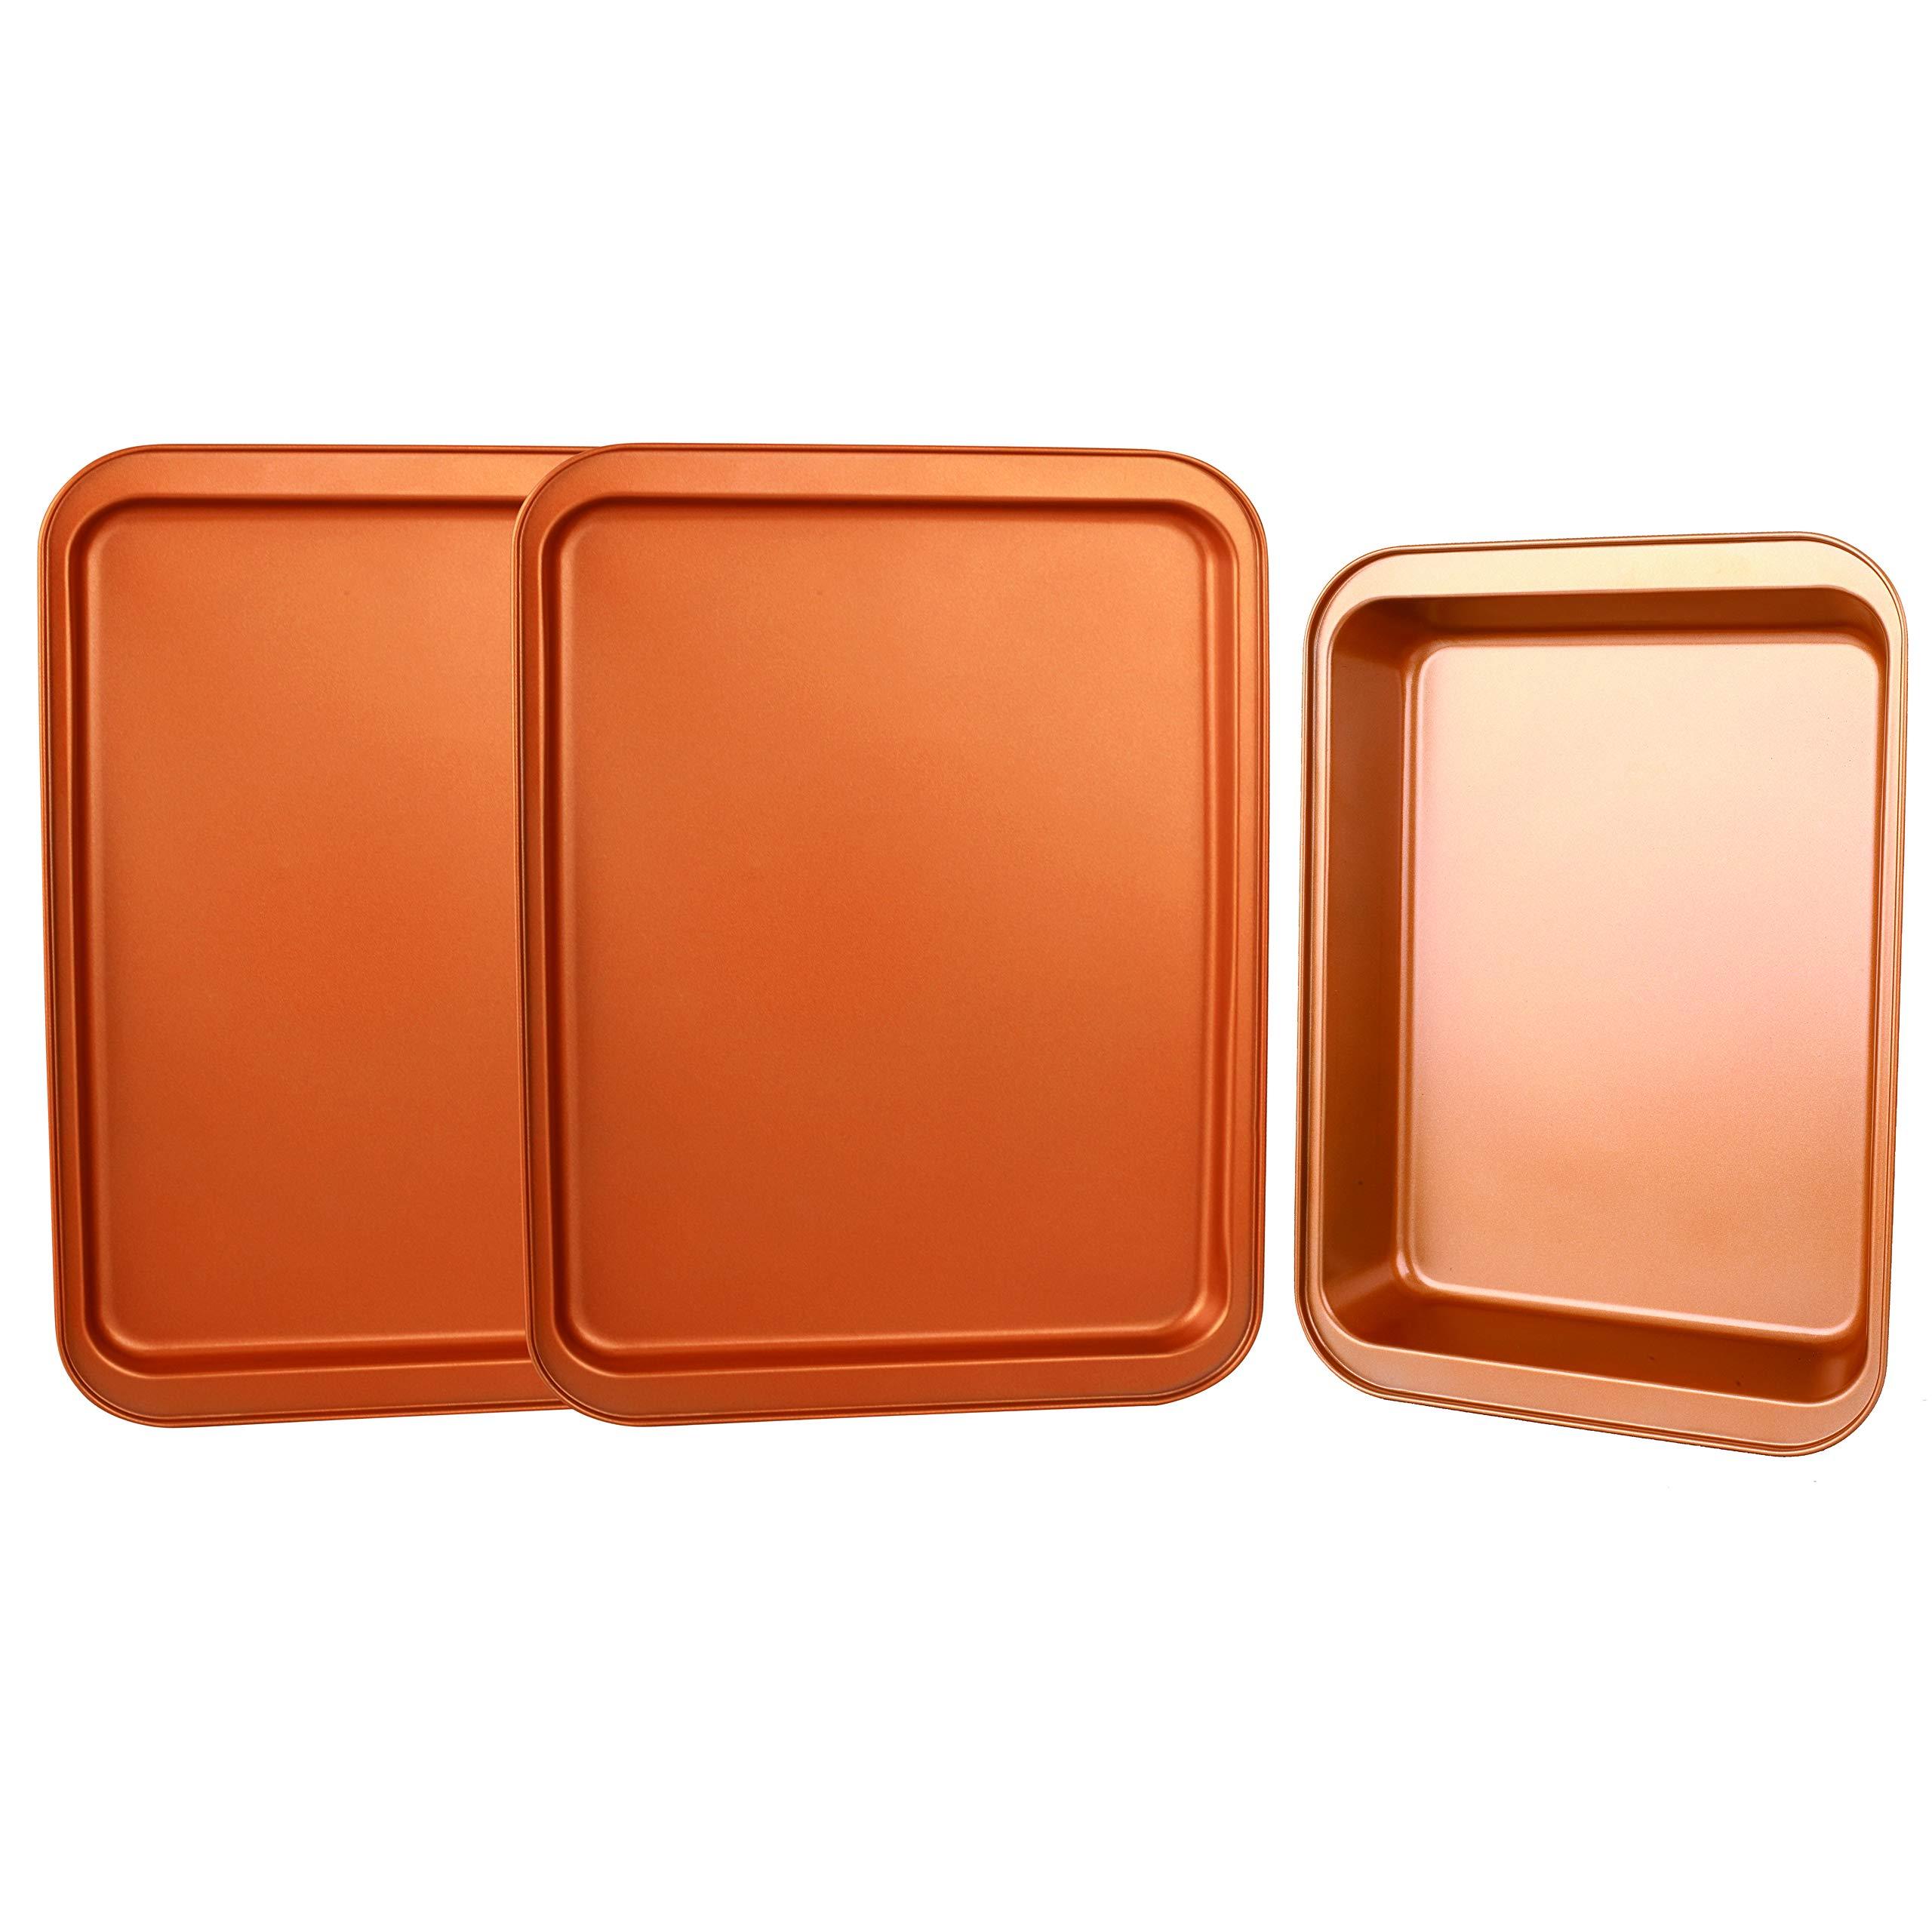 CopperKitchen Baking Pans - 3 pcs Toxic Free NONSTICK - Organic Environmental Friendly Premium Coating - Durable Quality - Rectangle Pan, Cookie Sheet - BAKEWARE SET (3) by CopperKitchenUSA (Image #9)